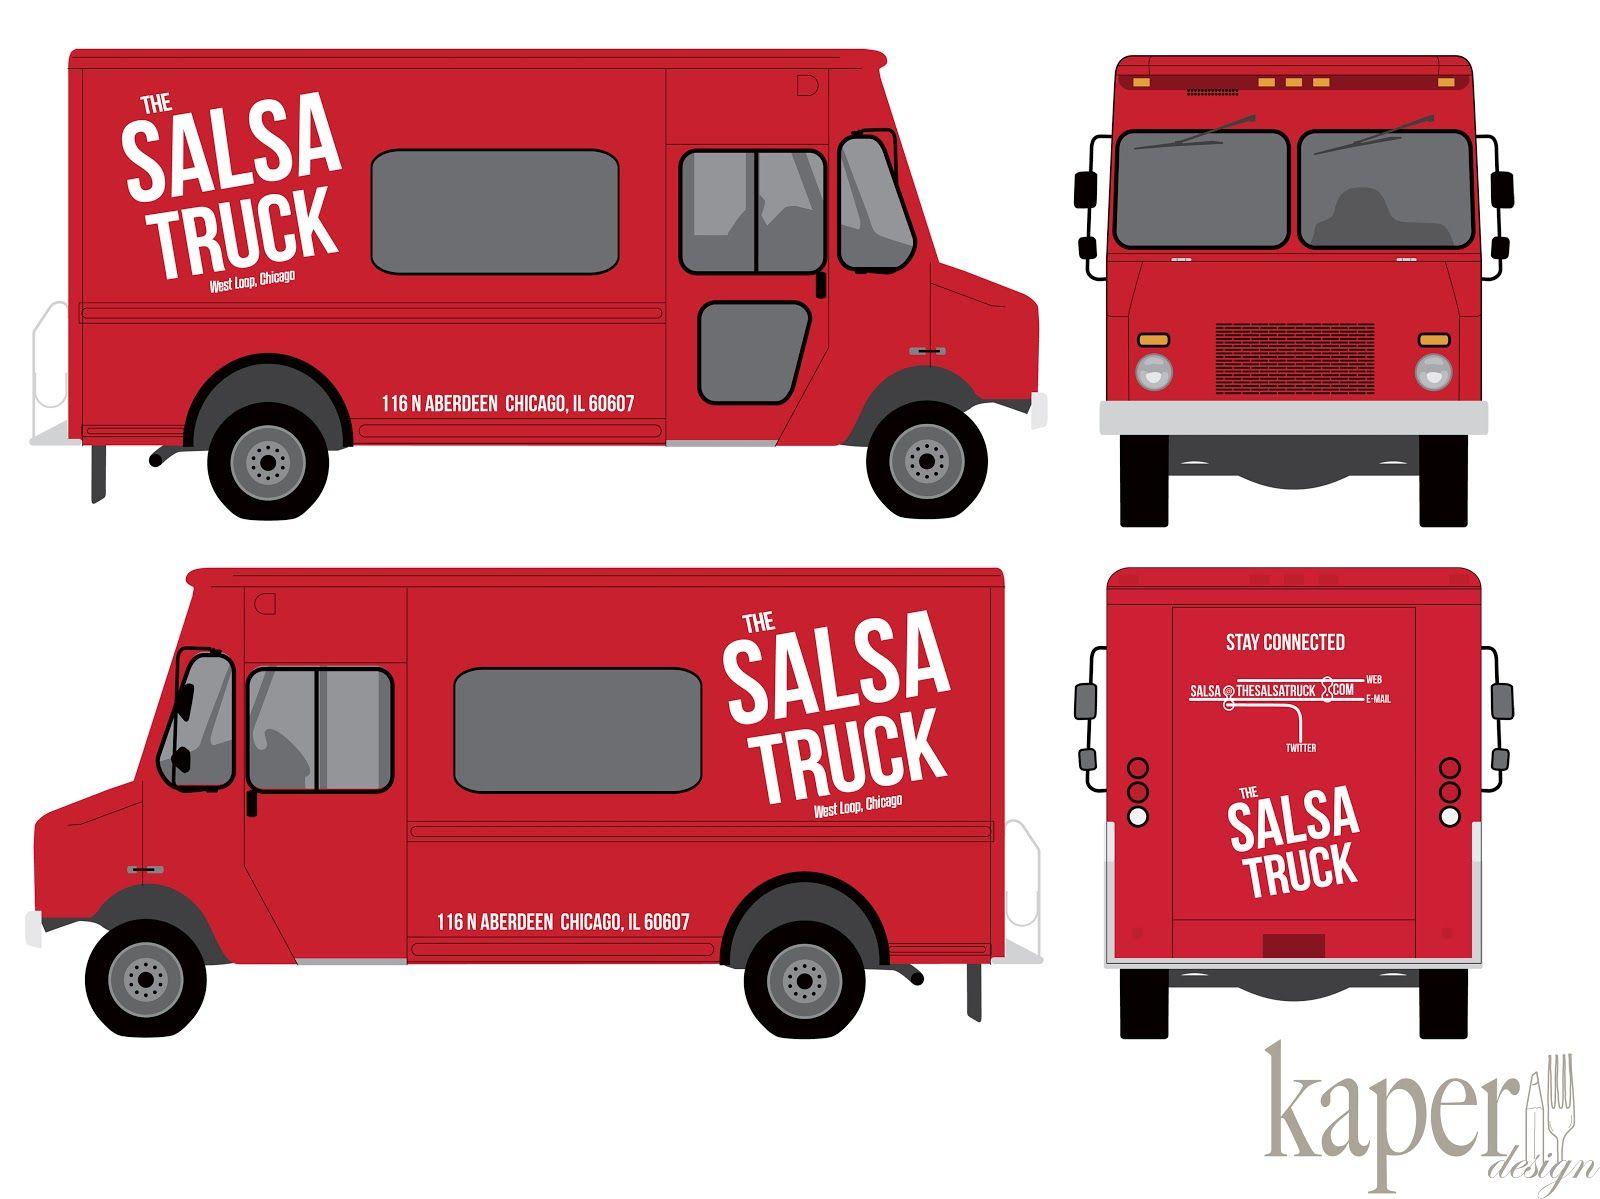 Kaper Design Restaurant Hospitality Design Inspiration Our Work The Salsa Truck Design Hospitality Design Salsa